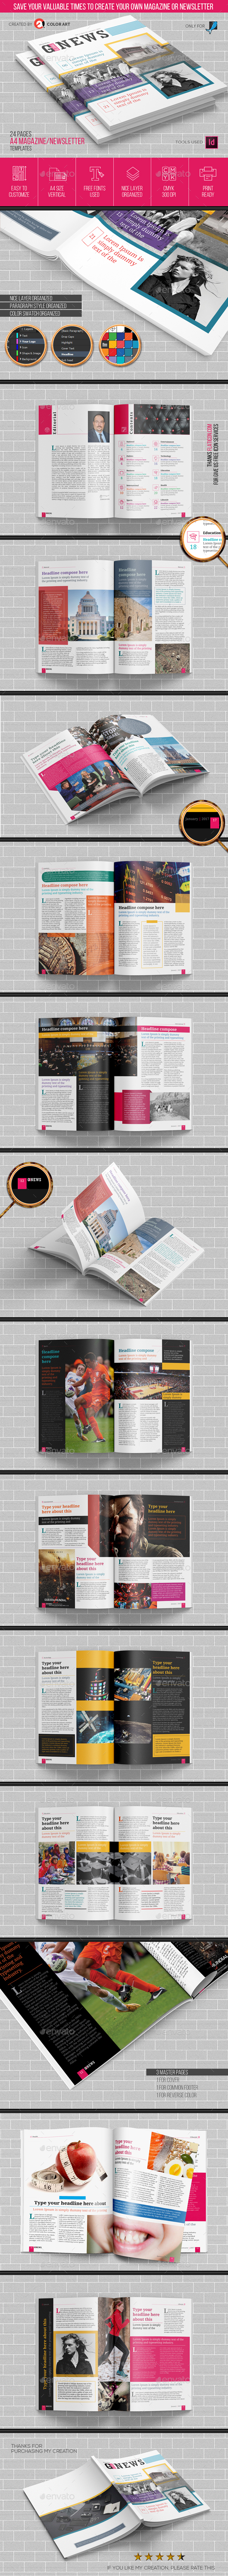 Magazine Newsletter Templates V.1 - Magazines Print Templates